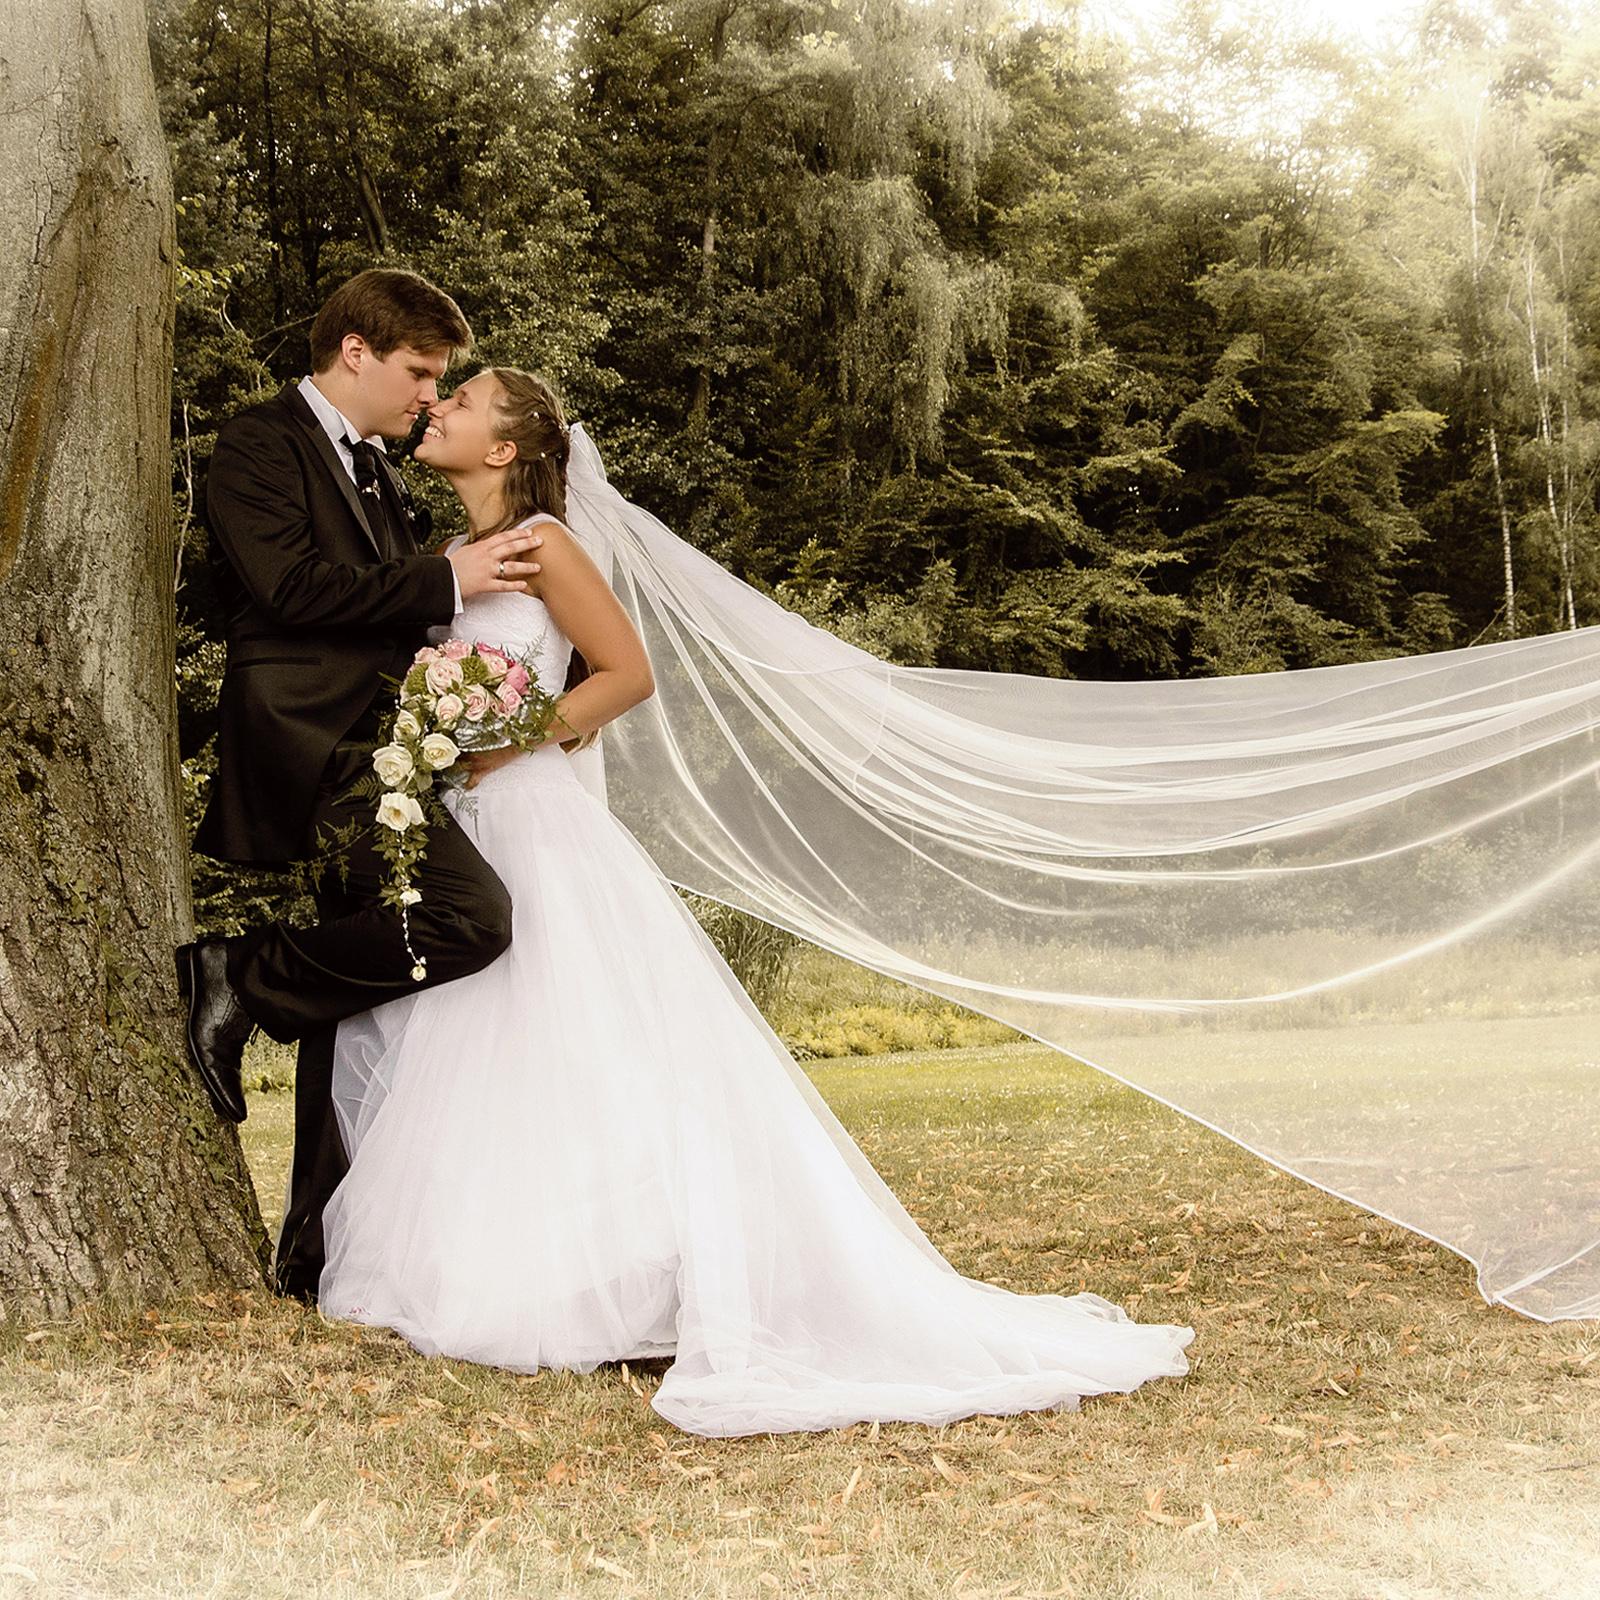 http://www.fotoatelier-gabriele.de/wp-content/uploads/2017/04/Hochzeit-kleiner.jpg